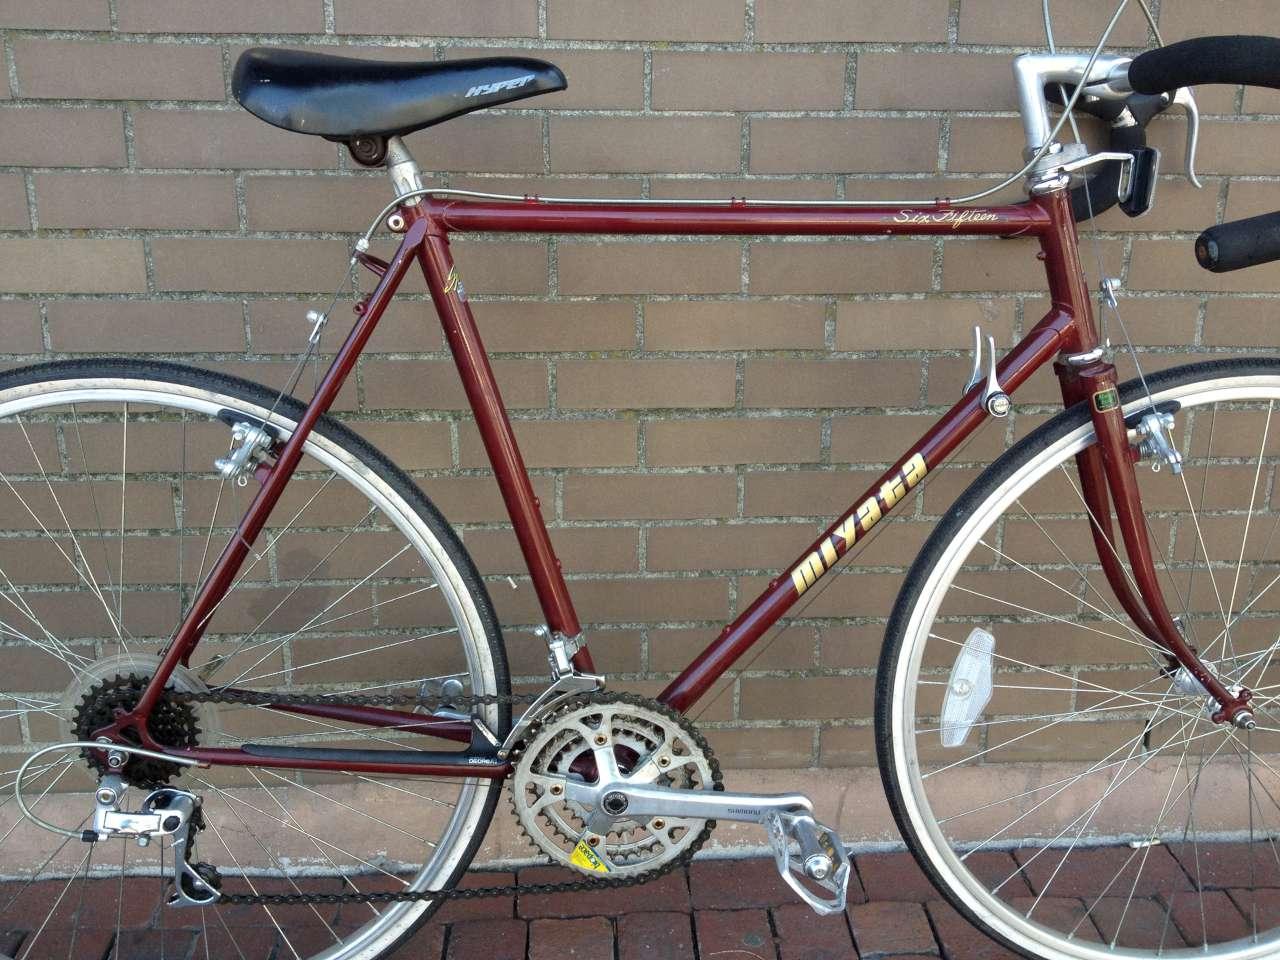 Bike Boom refurbished bikes: 1988 Miyata six fifteen touring